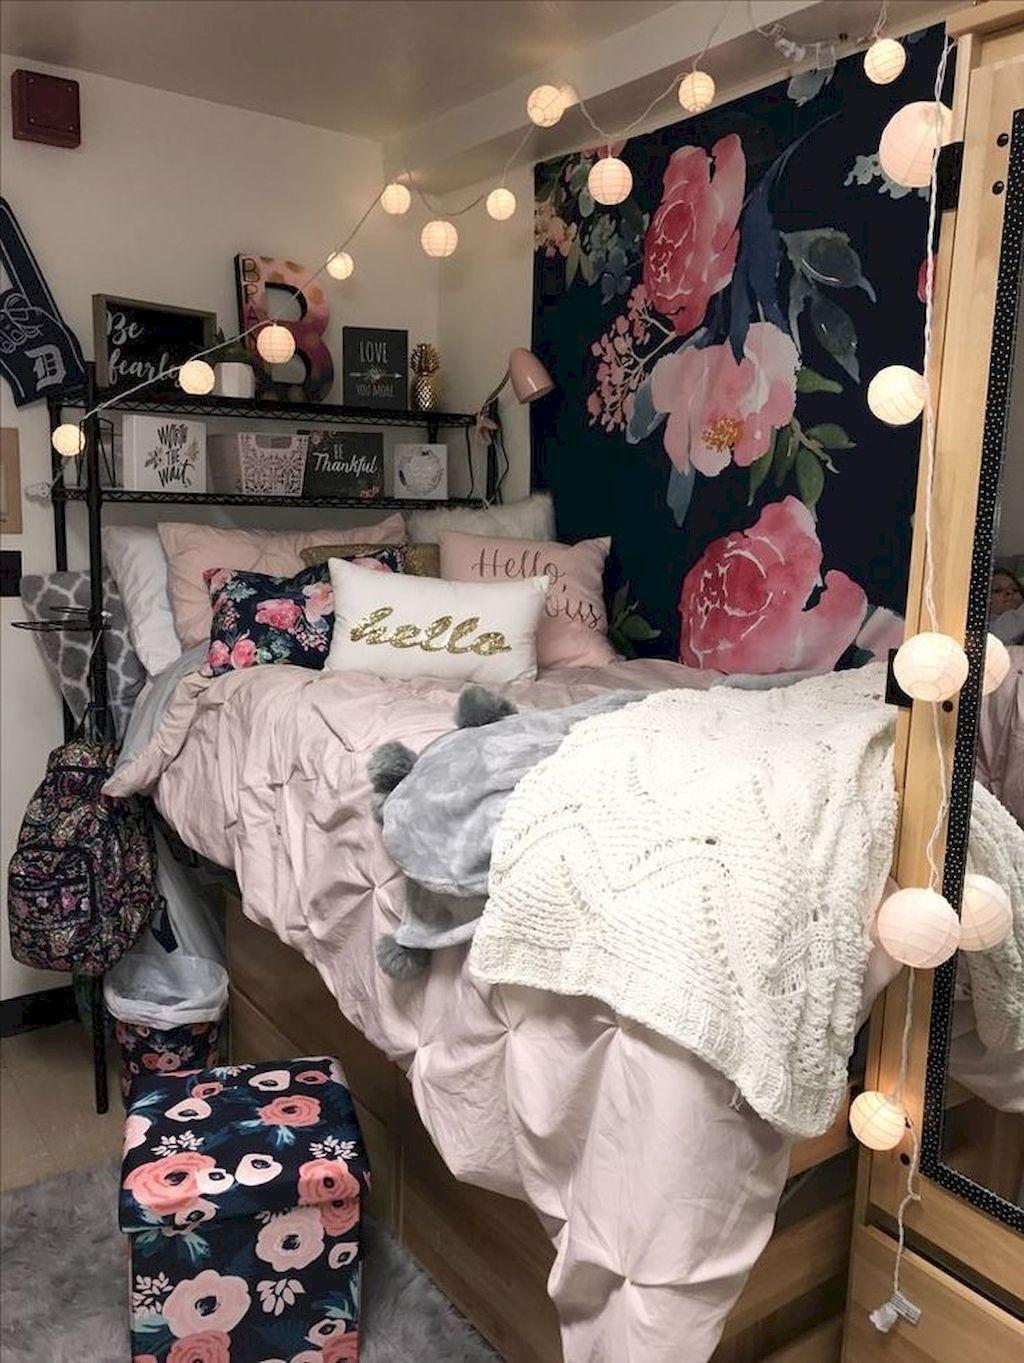 Cute Dorm Room Decorating Ideas On A Budget 37 Dorm Room Inspiration Girls Dorm Room Dorm Room Decor